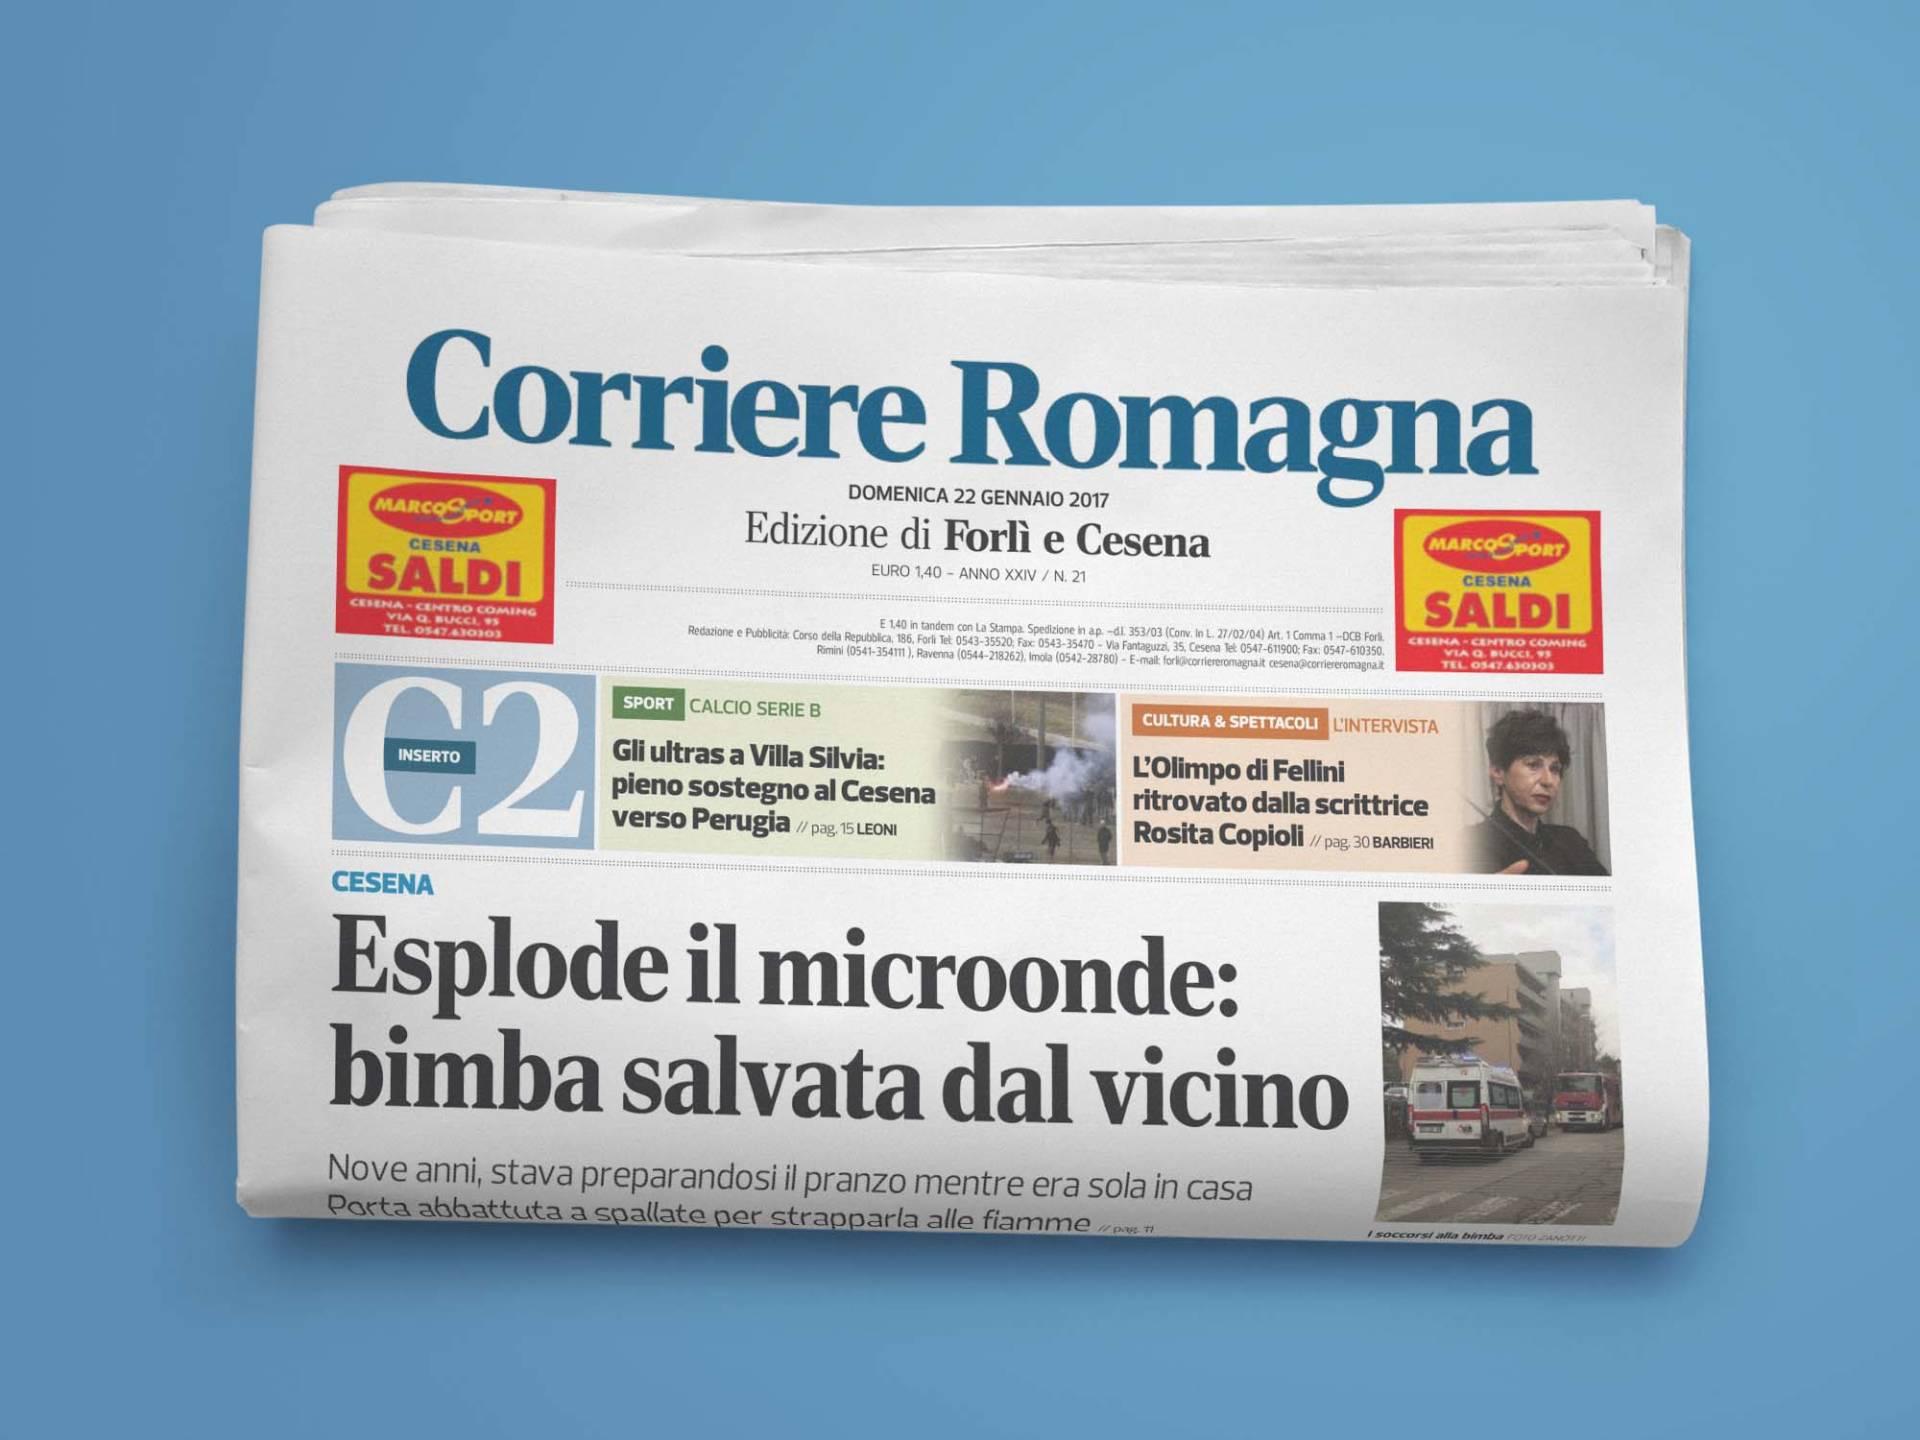 Corriere_Romagna_01_Wenceslau_News_Design